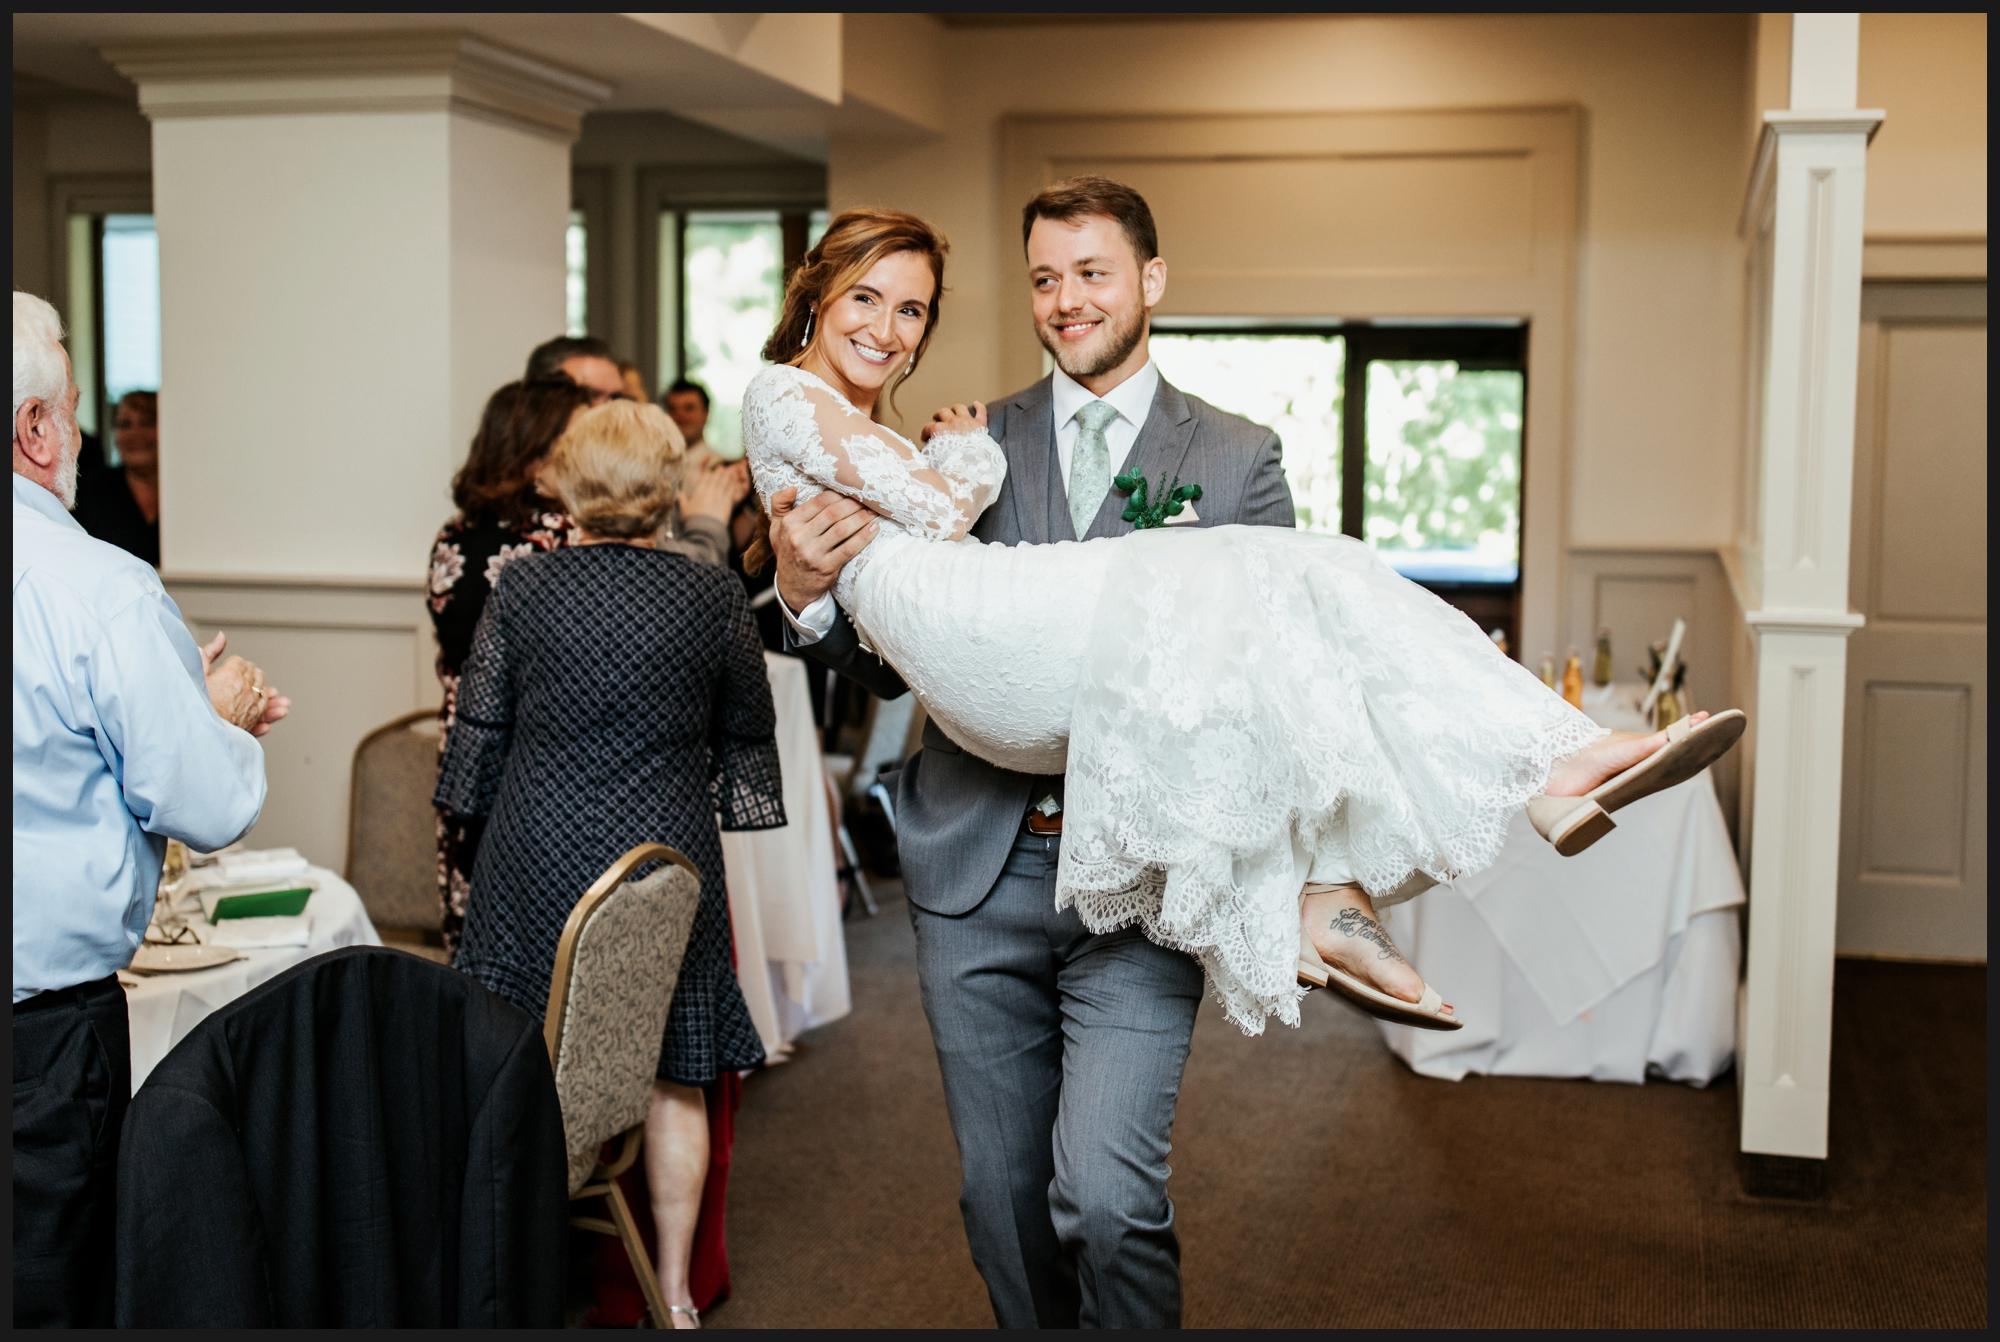 Orlando-Wedding-Photographer-destination-wedding-photographer-florida-wedding-photographer-hawaii-wedding-photographer_0166.jpg